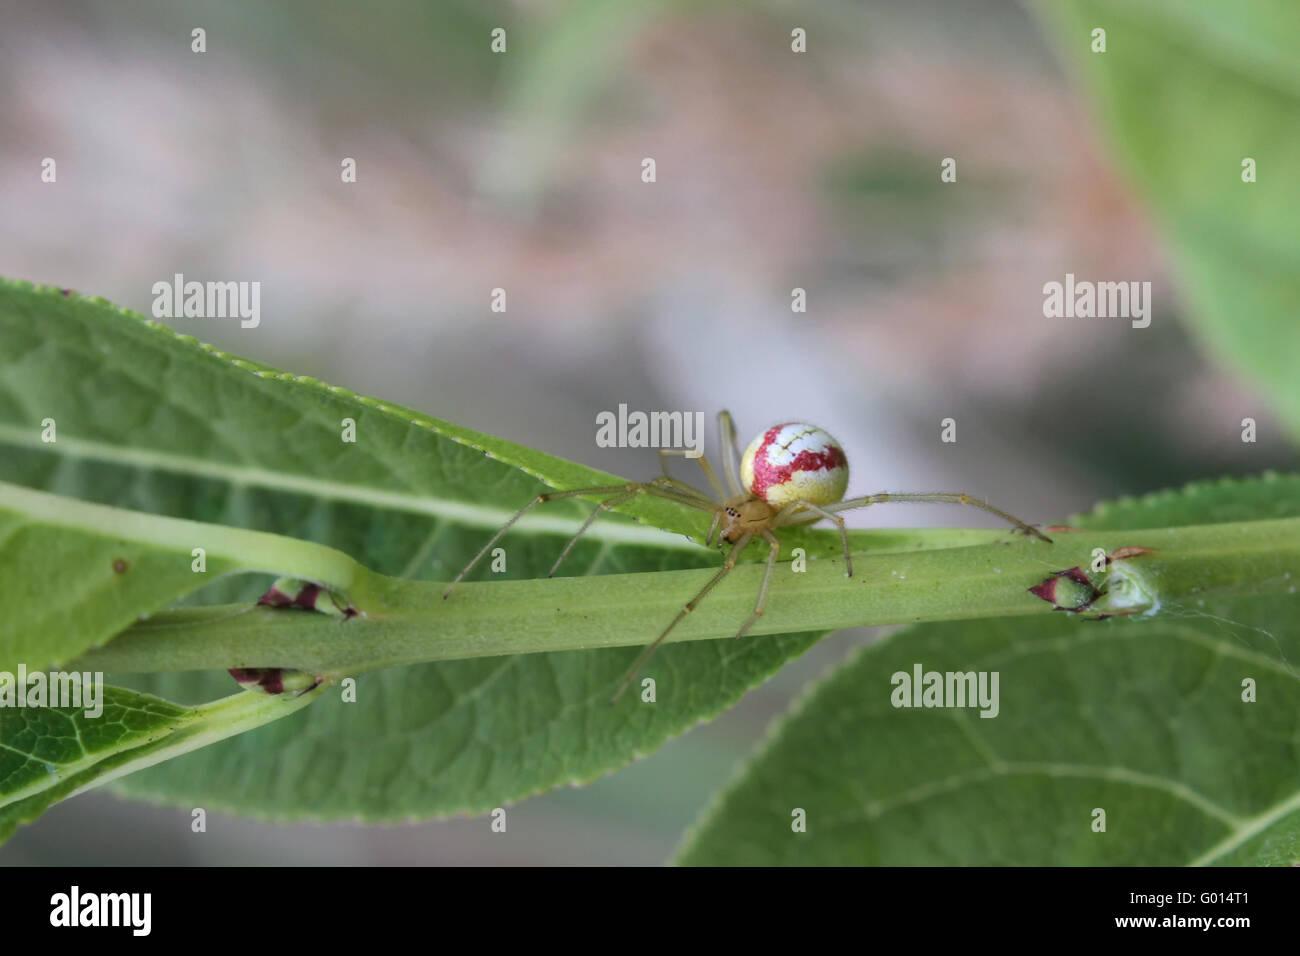 Enoplognatha lineata, a cobweb spider common in Europe. - Stock Image